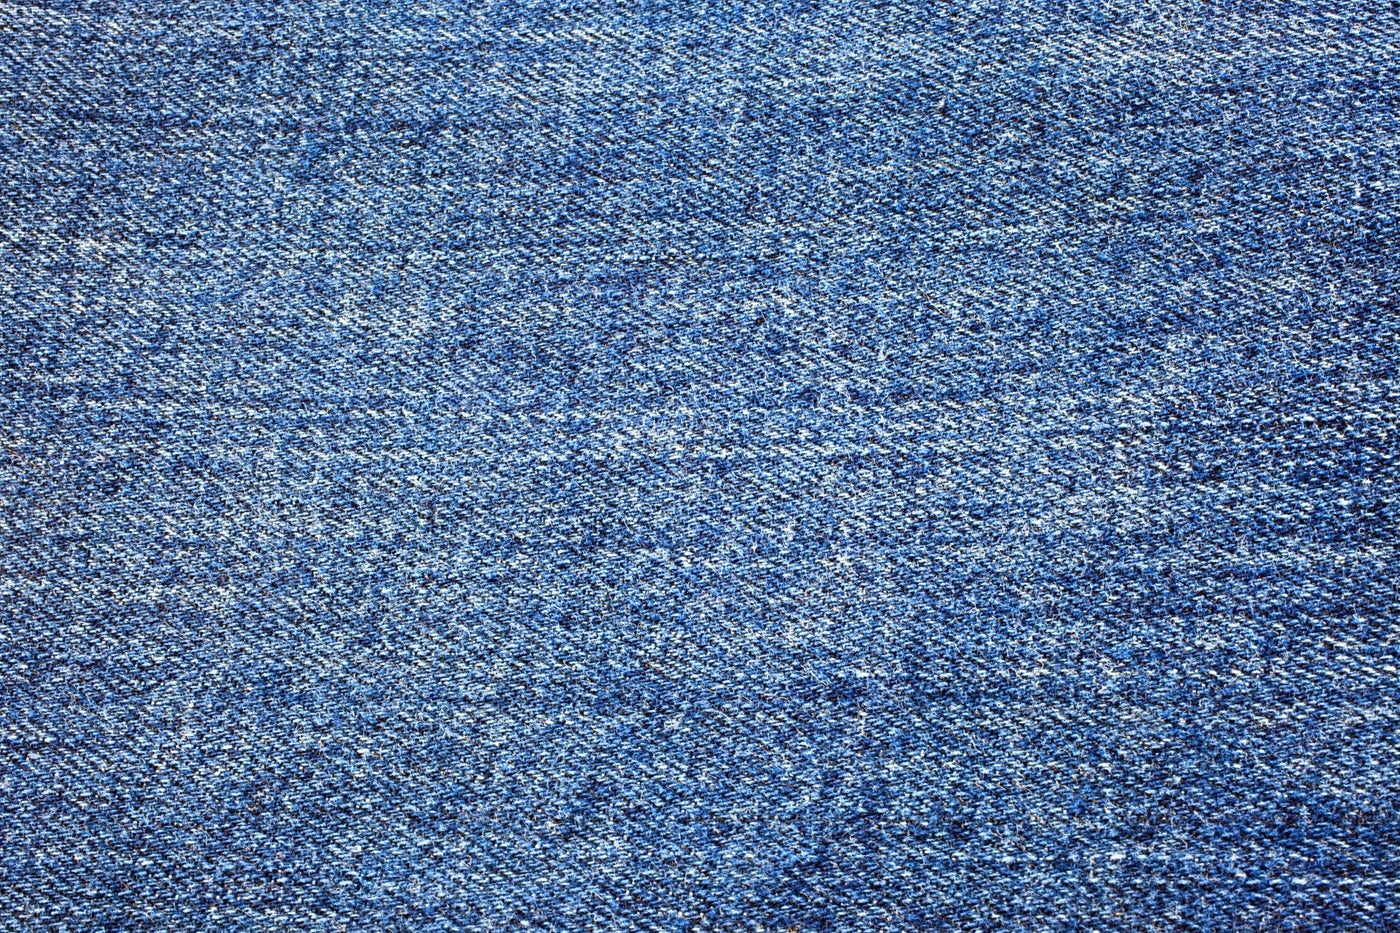 Blue Denim Background: Stock Photos